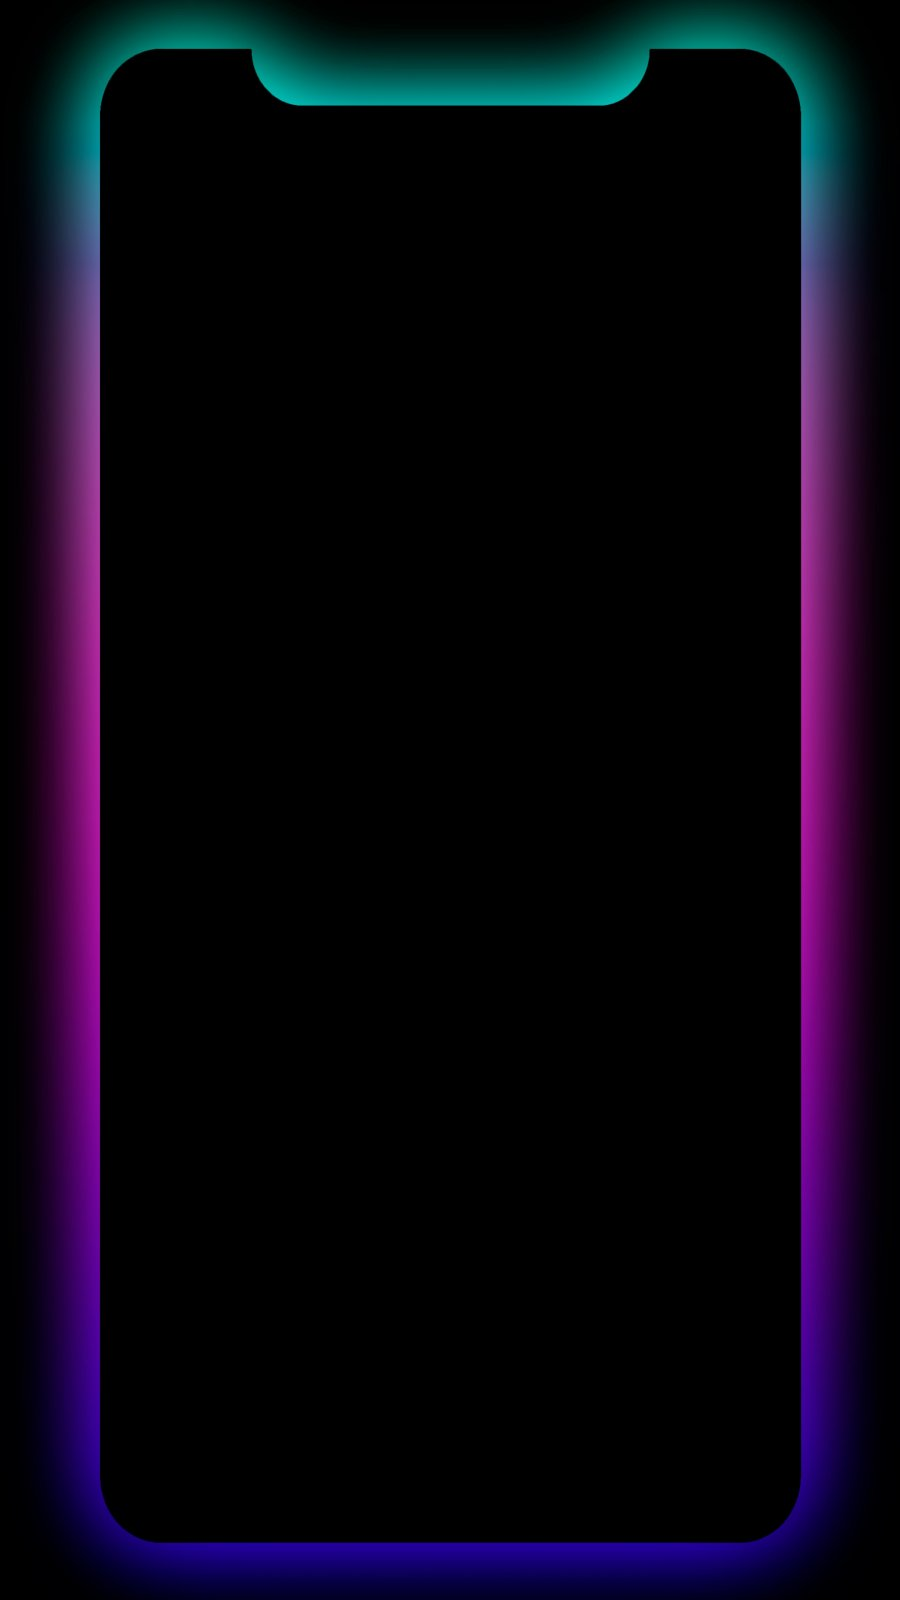 iPhone RGB Background